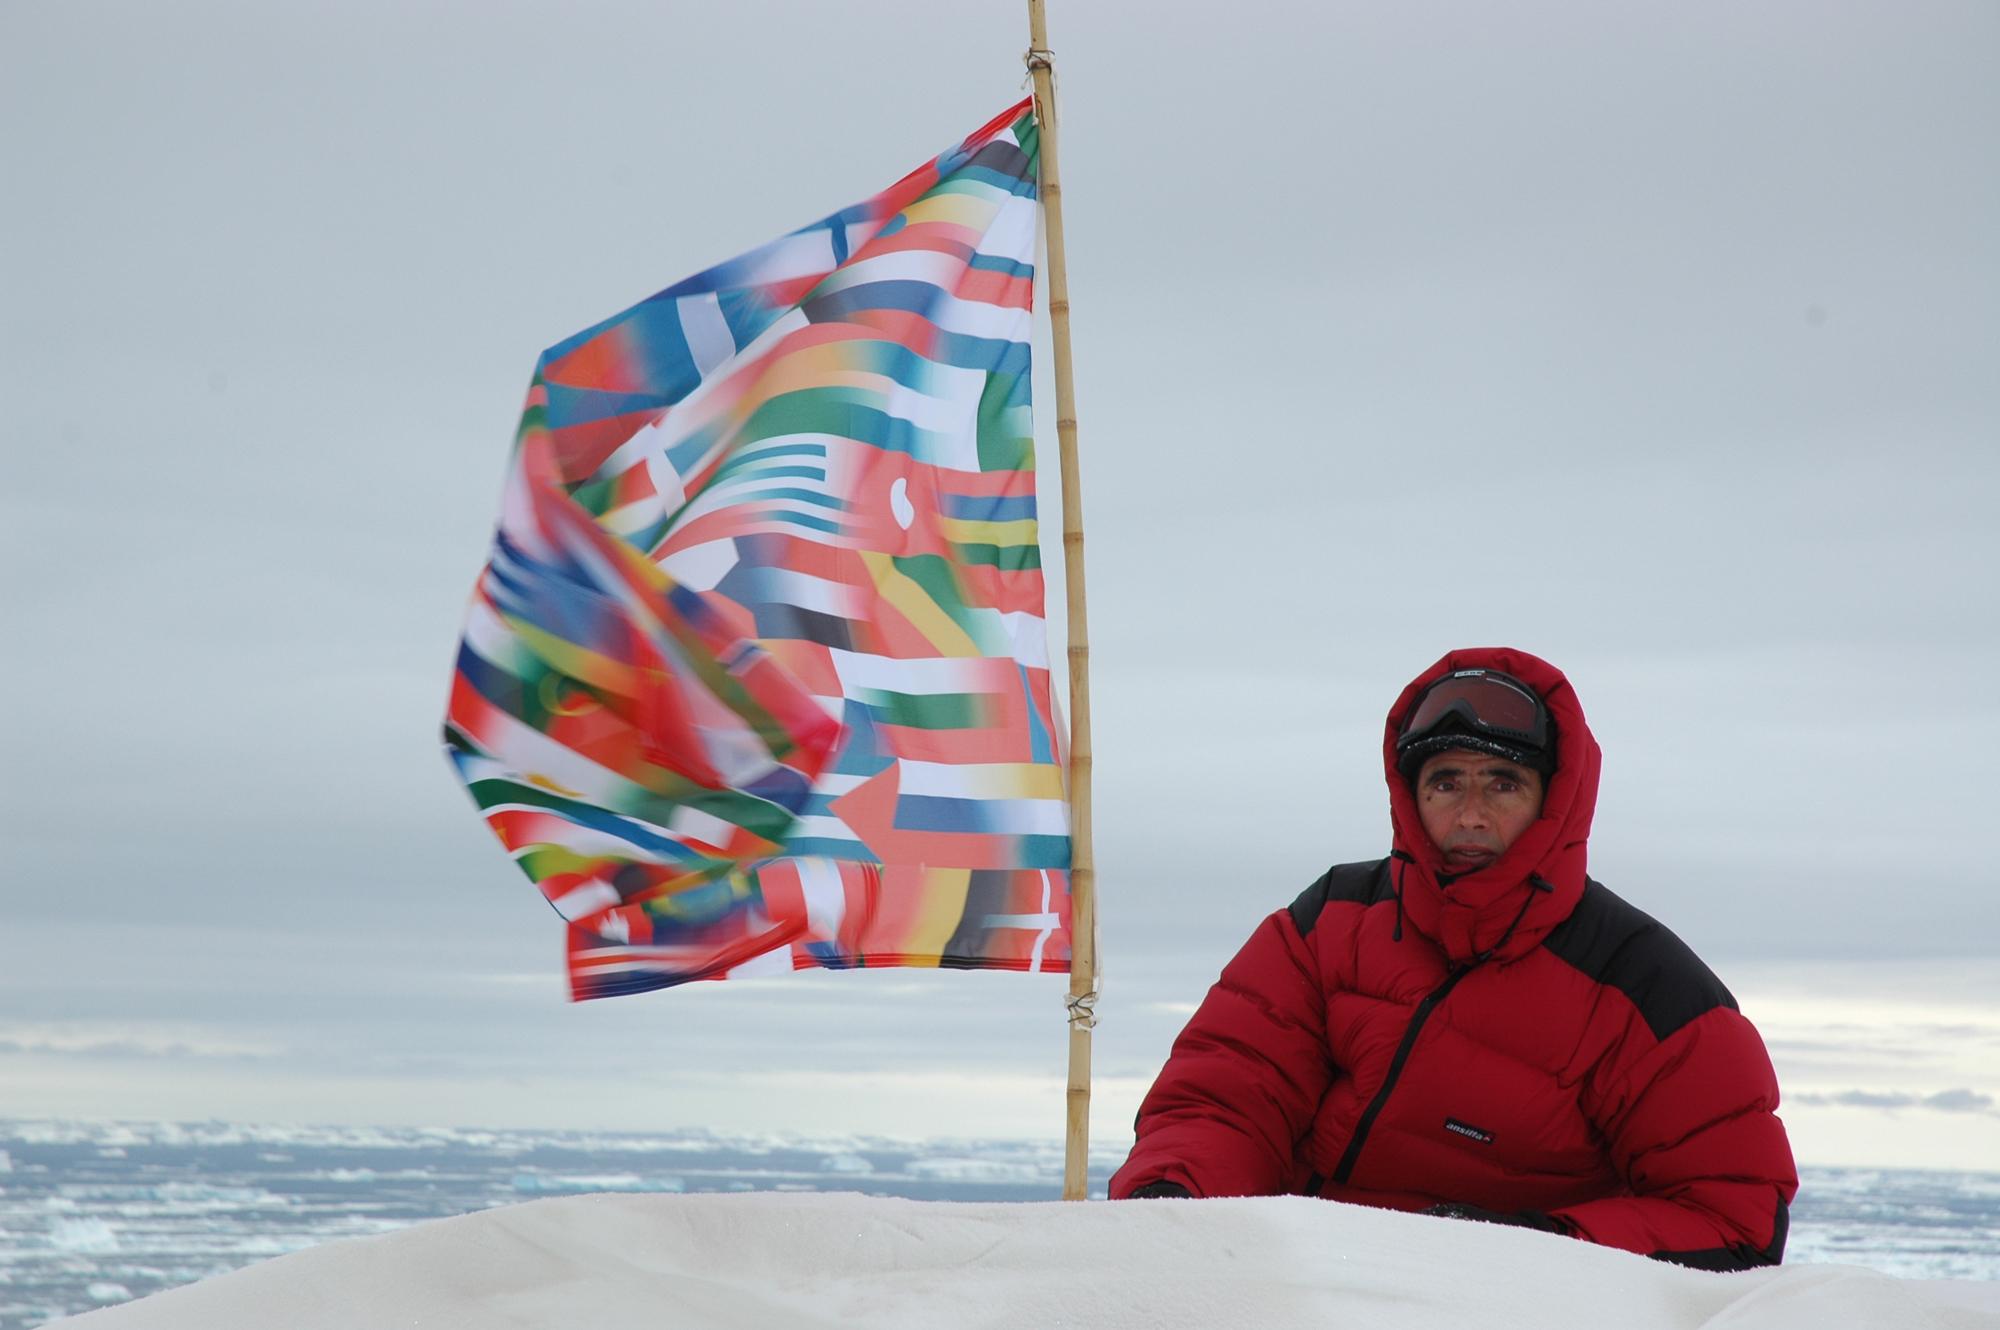 29_Orta_AntarcticFlag_2000px.jpg